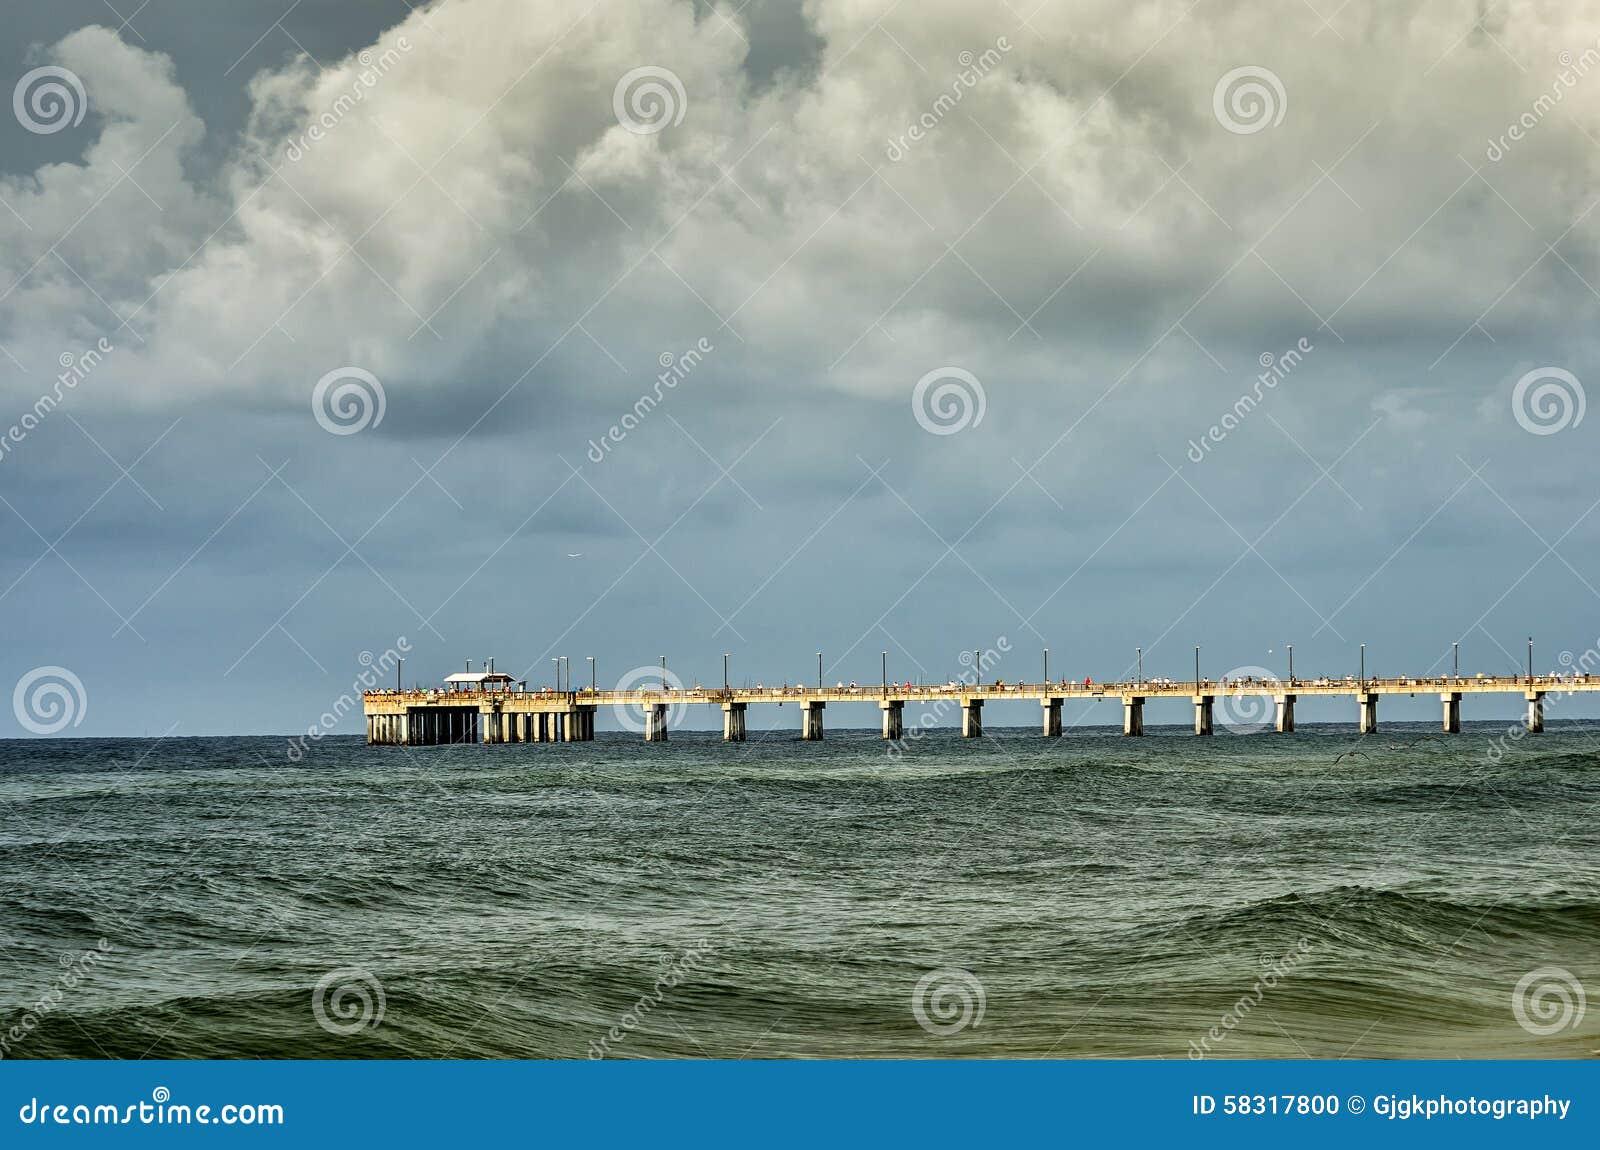 Gulf shores al fishing pier stock photo image 58317800 for Gulf shores alabama fishing